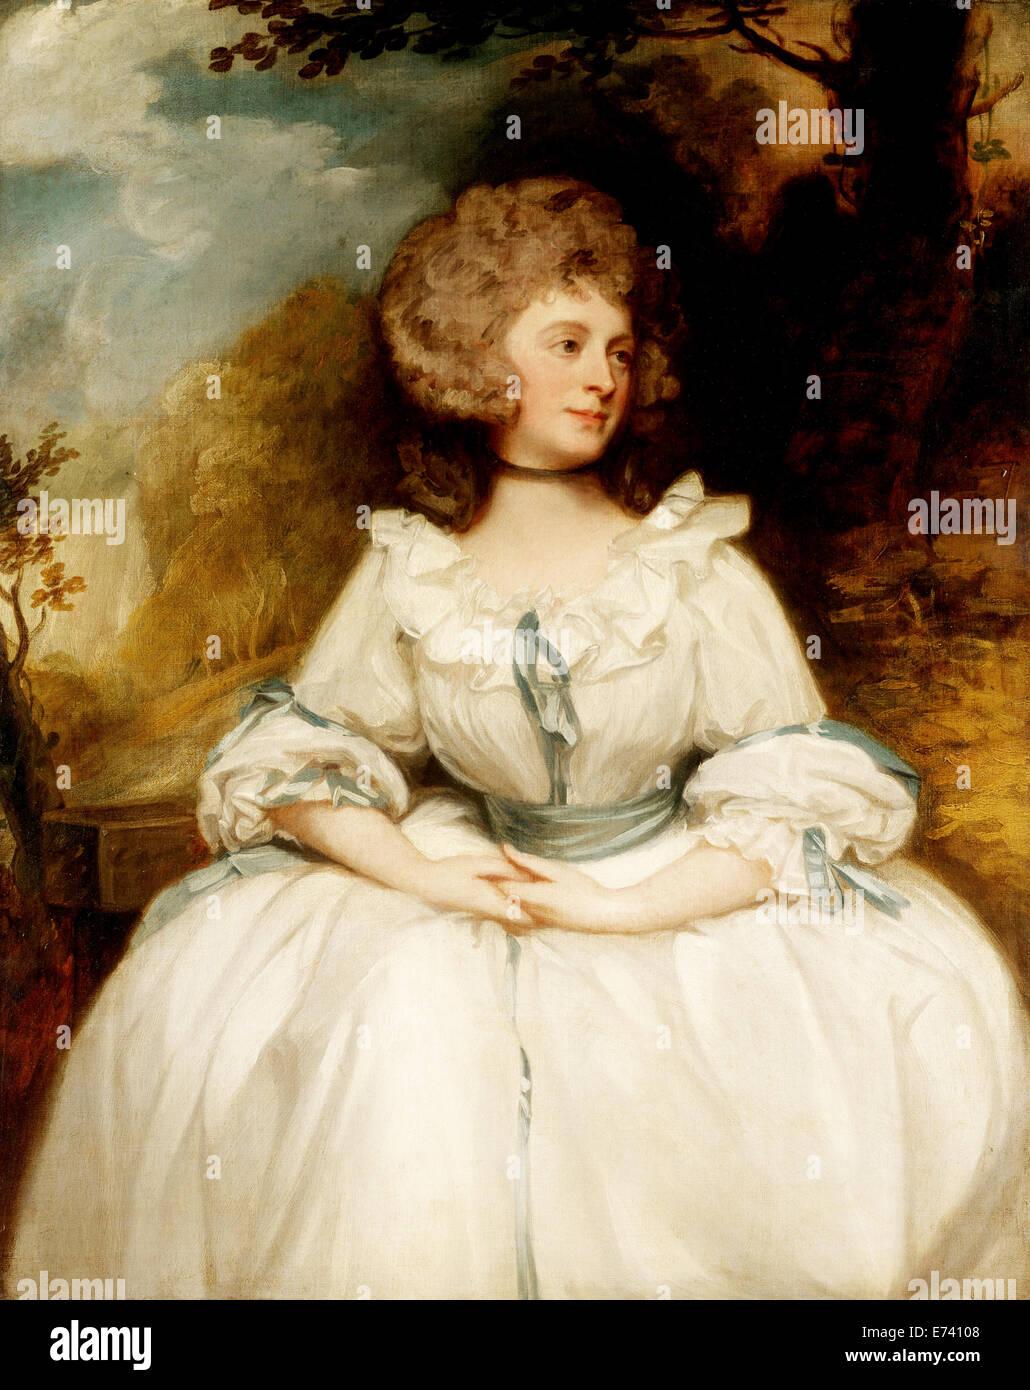 Lady Lemon - by George Romne, 1780's - Stock Image